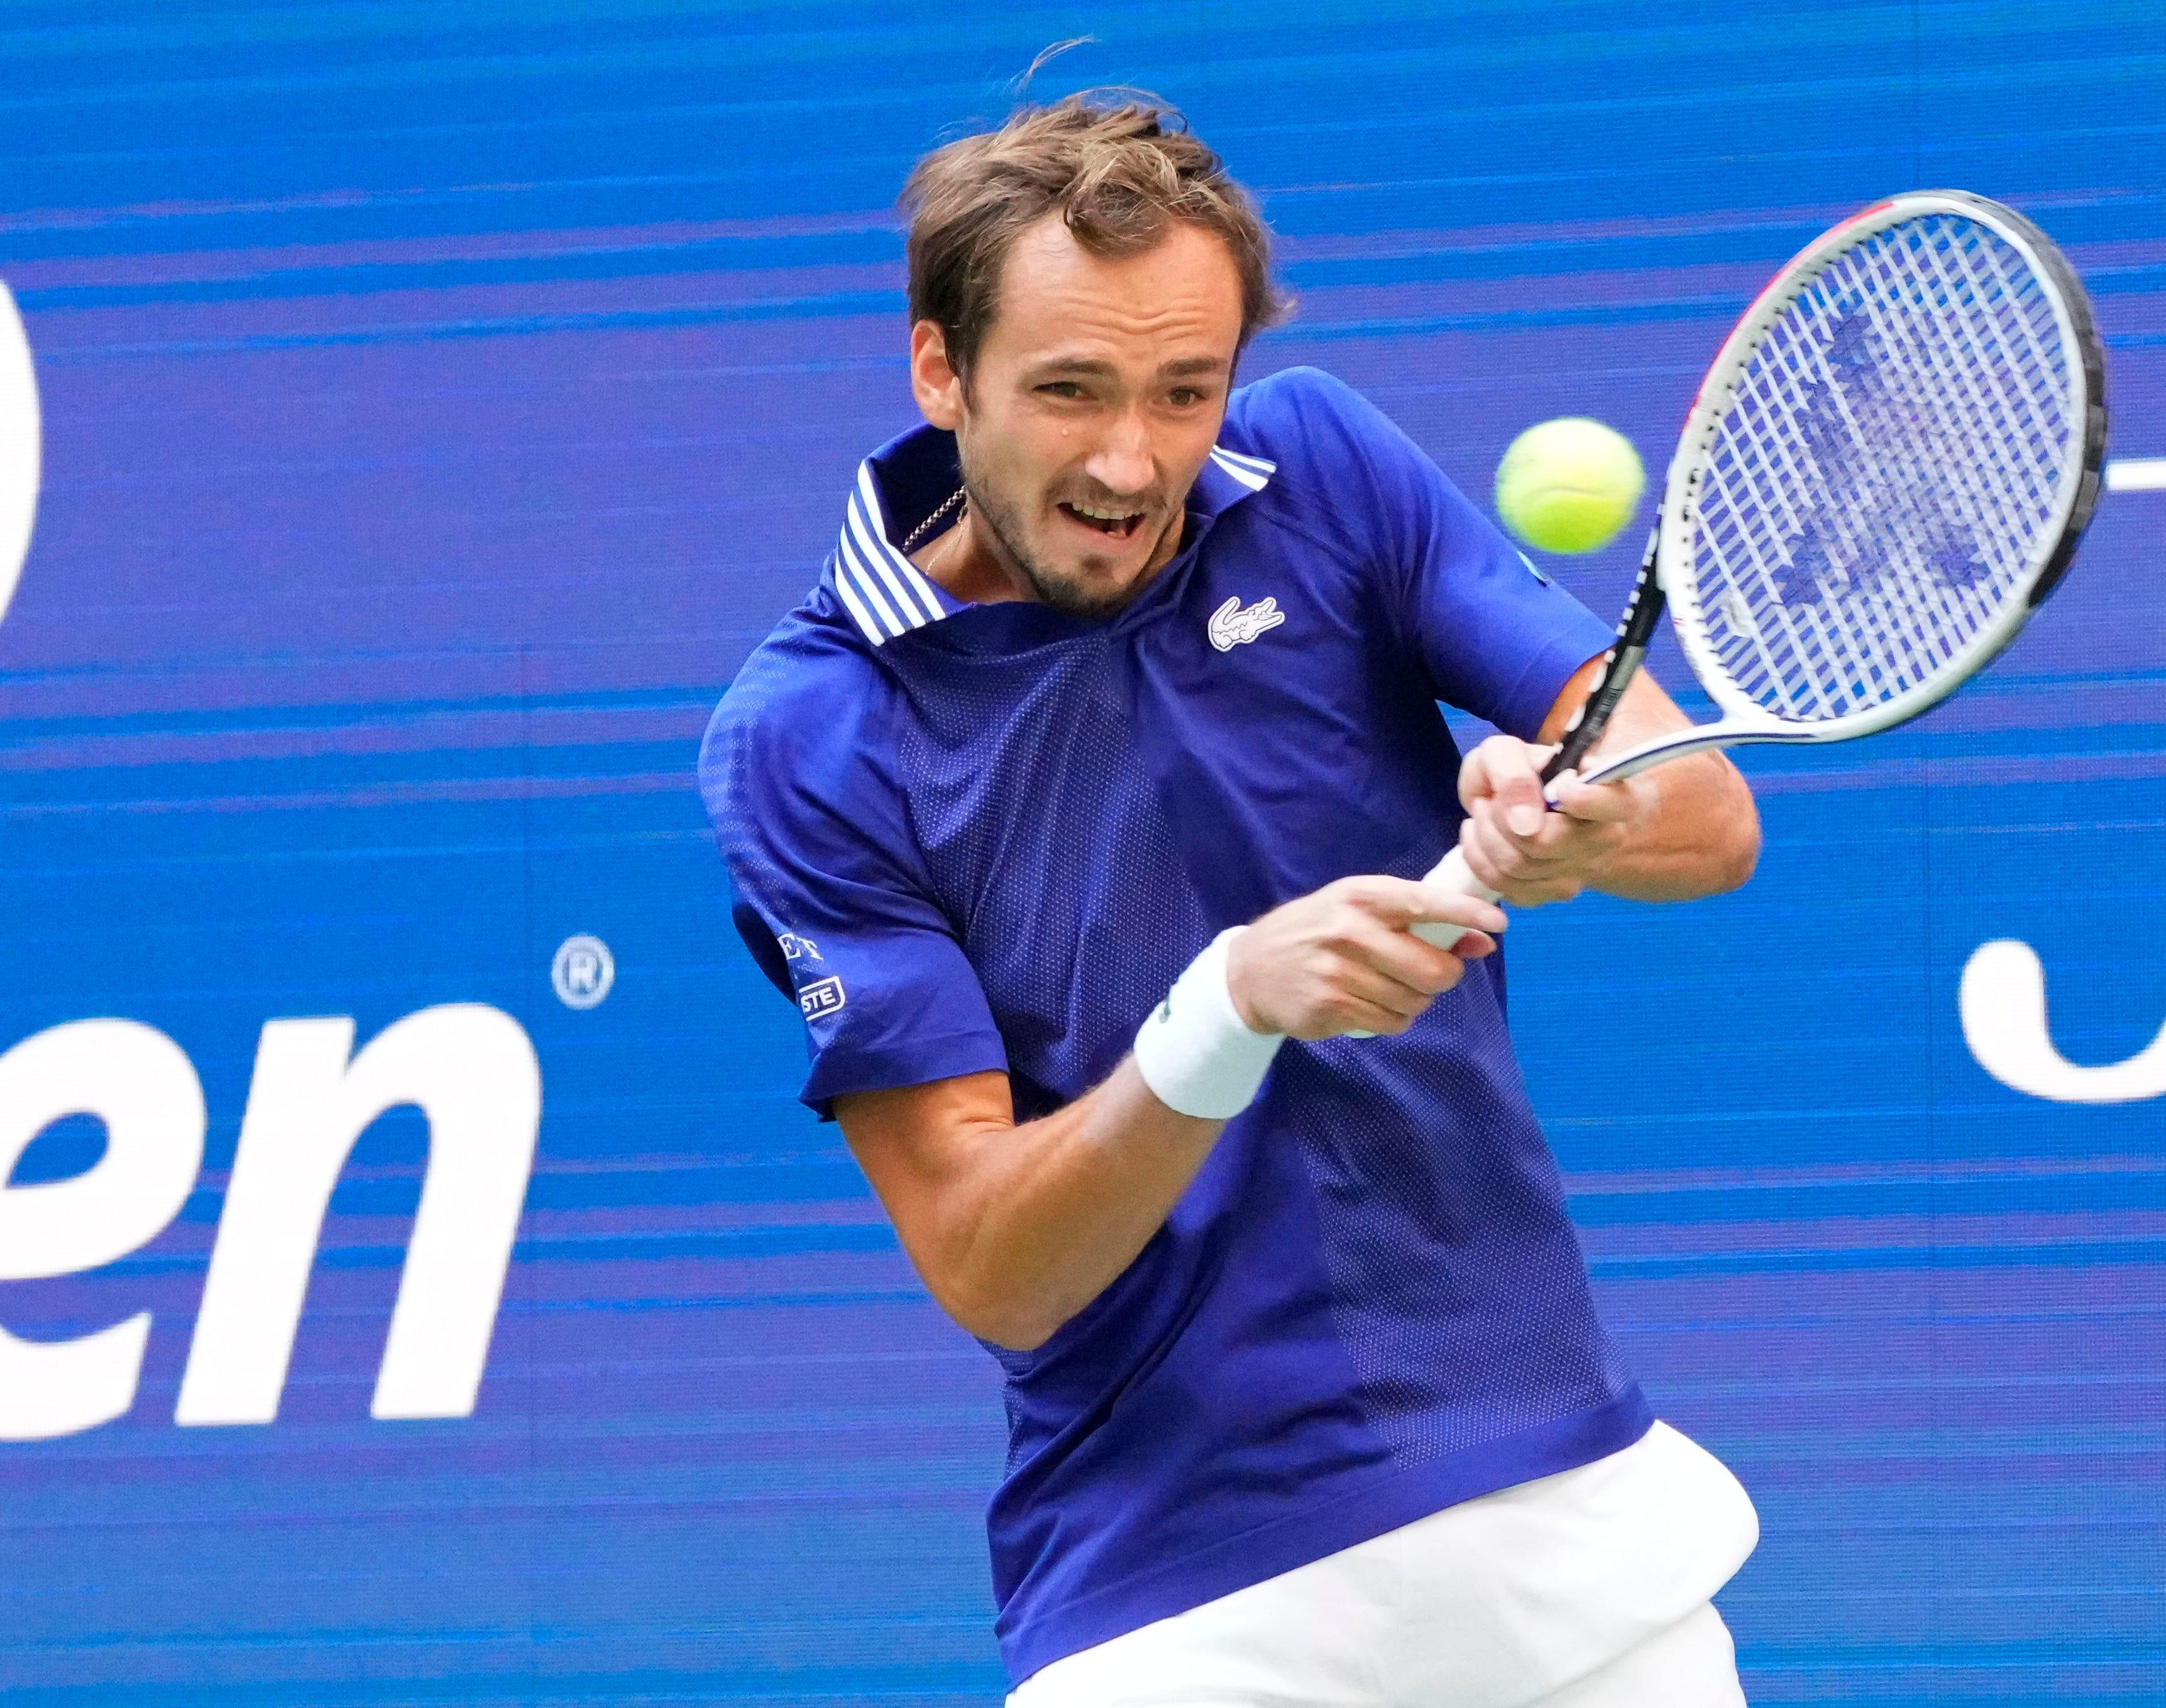 US Open: Daniil Medvedev beats Felix Auger-Aliassime to reach final